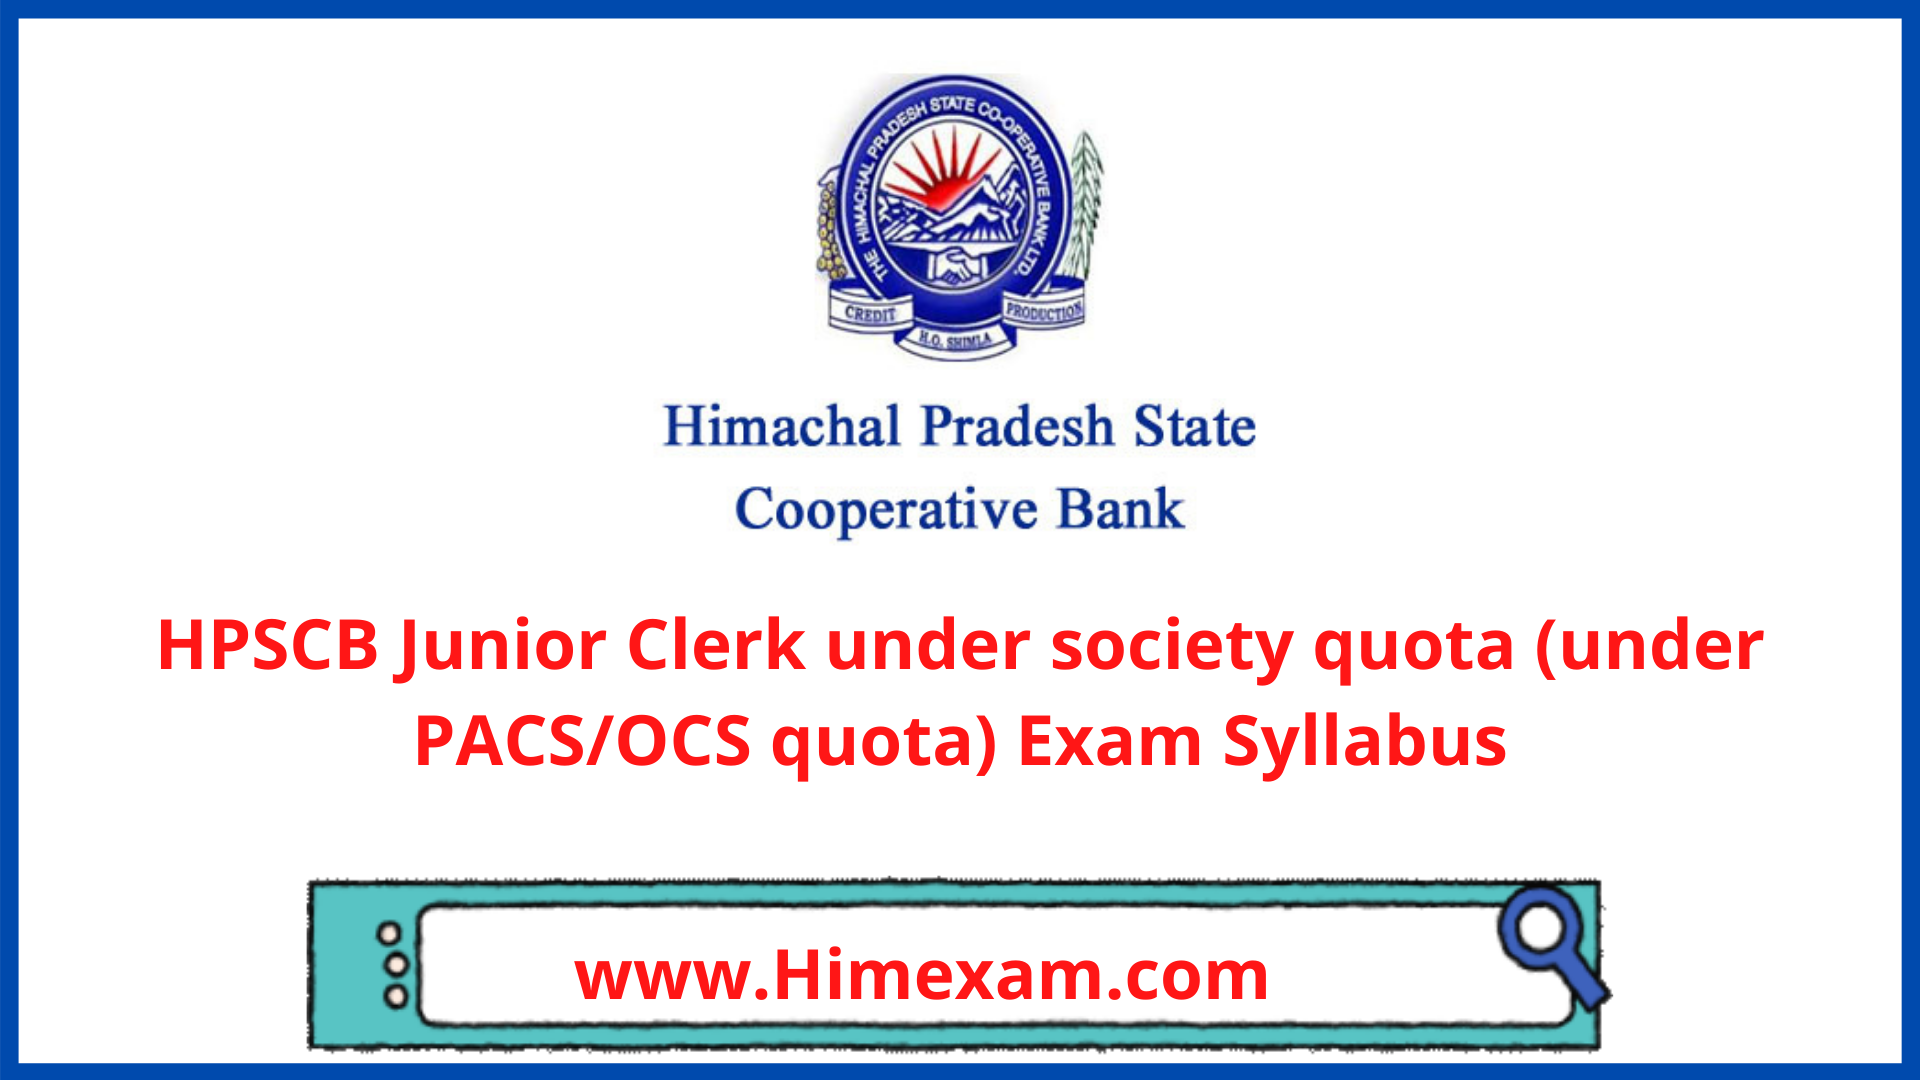 HPSCB Junior Clerk under society quota (under PACS/OCS quota) Exam Syllabus